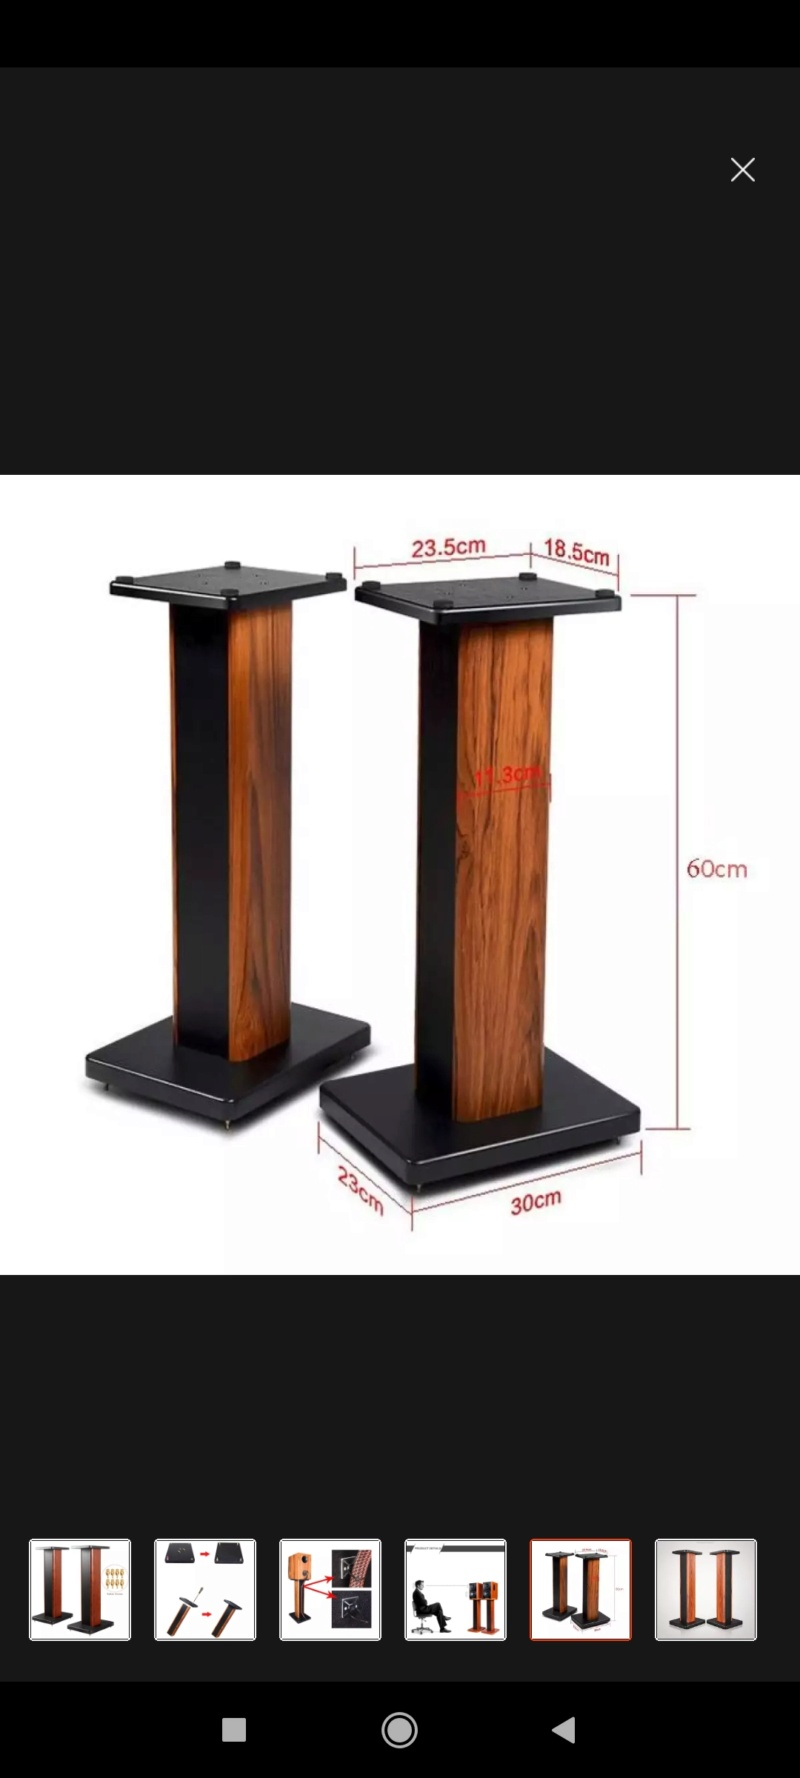 Dmseinc Wooden Mdf board Speaker Stand S008 (60cm)(sold) Screen13